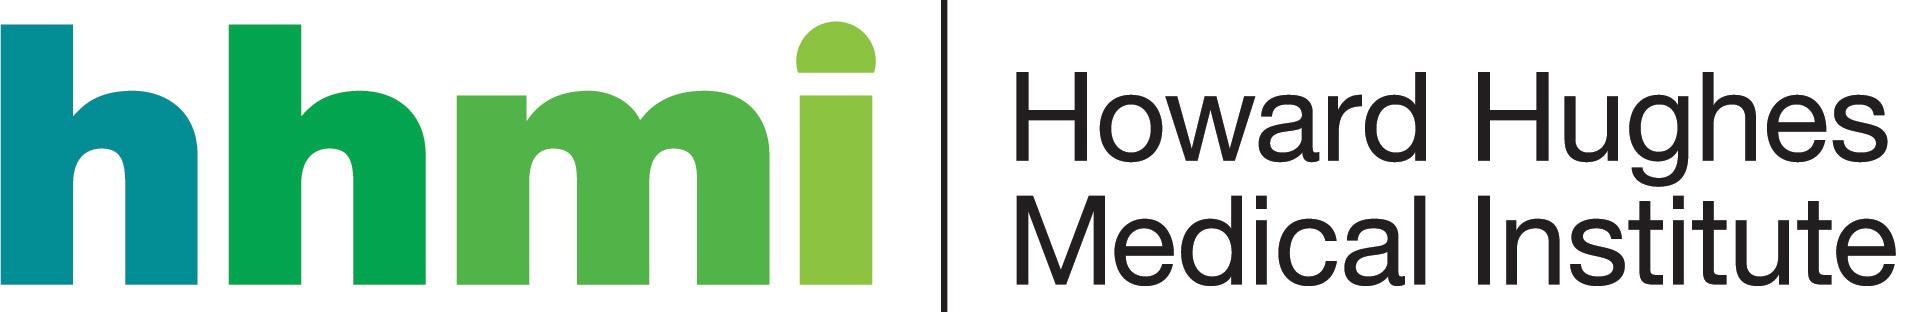 Logo of Howard Hughes Medical Institute